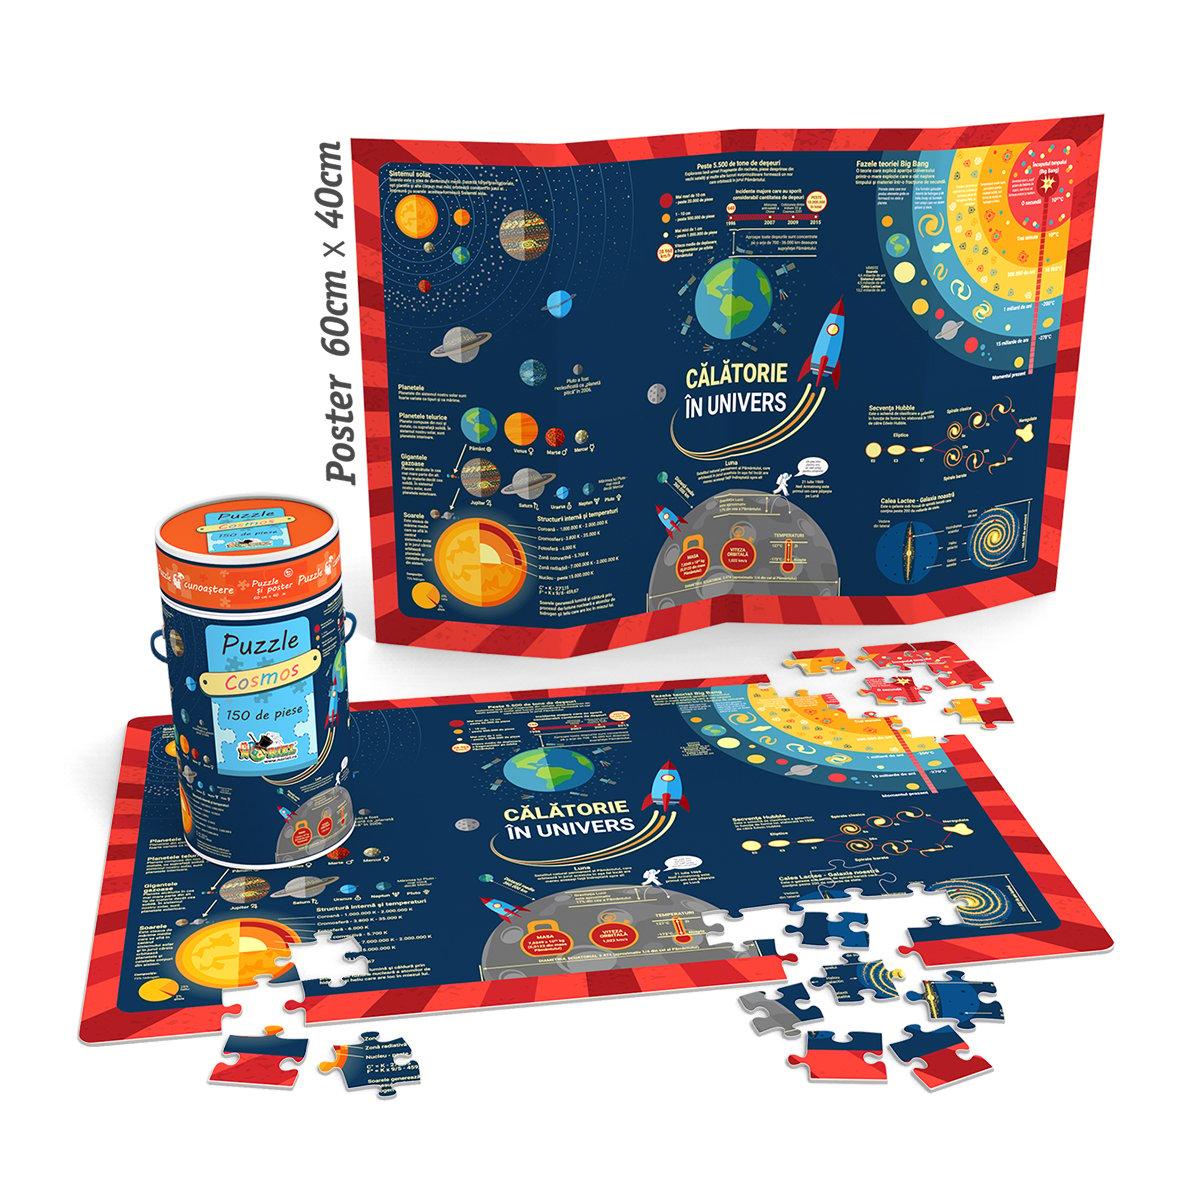 Puzzle Cunoastere Noriel - Calatorie in univers. 150 piese